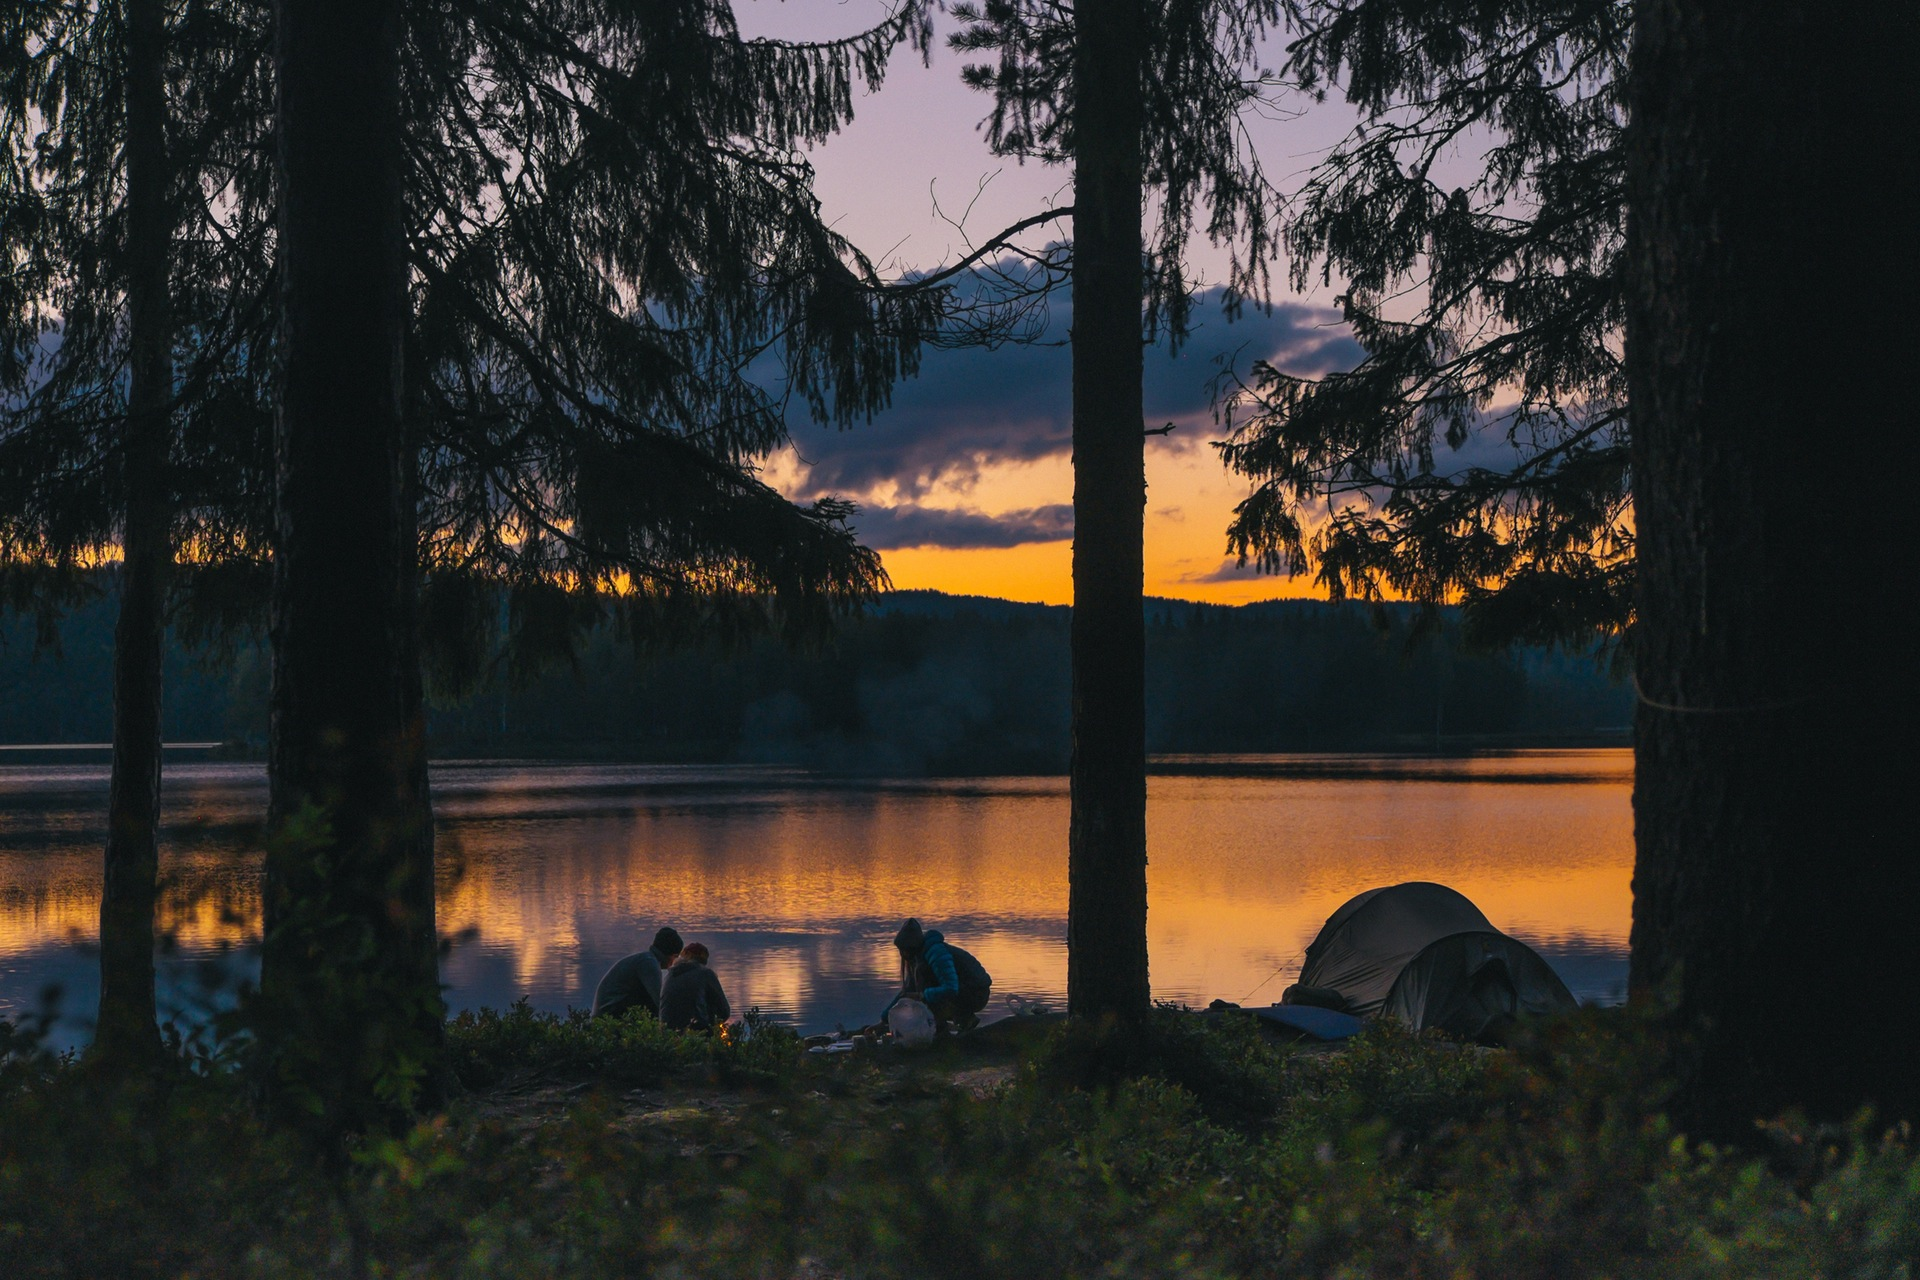 Sonnenuntergang, Skandinavien, Camping, Wald